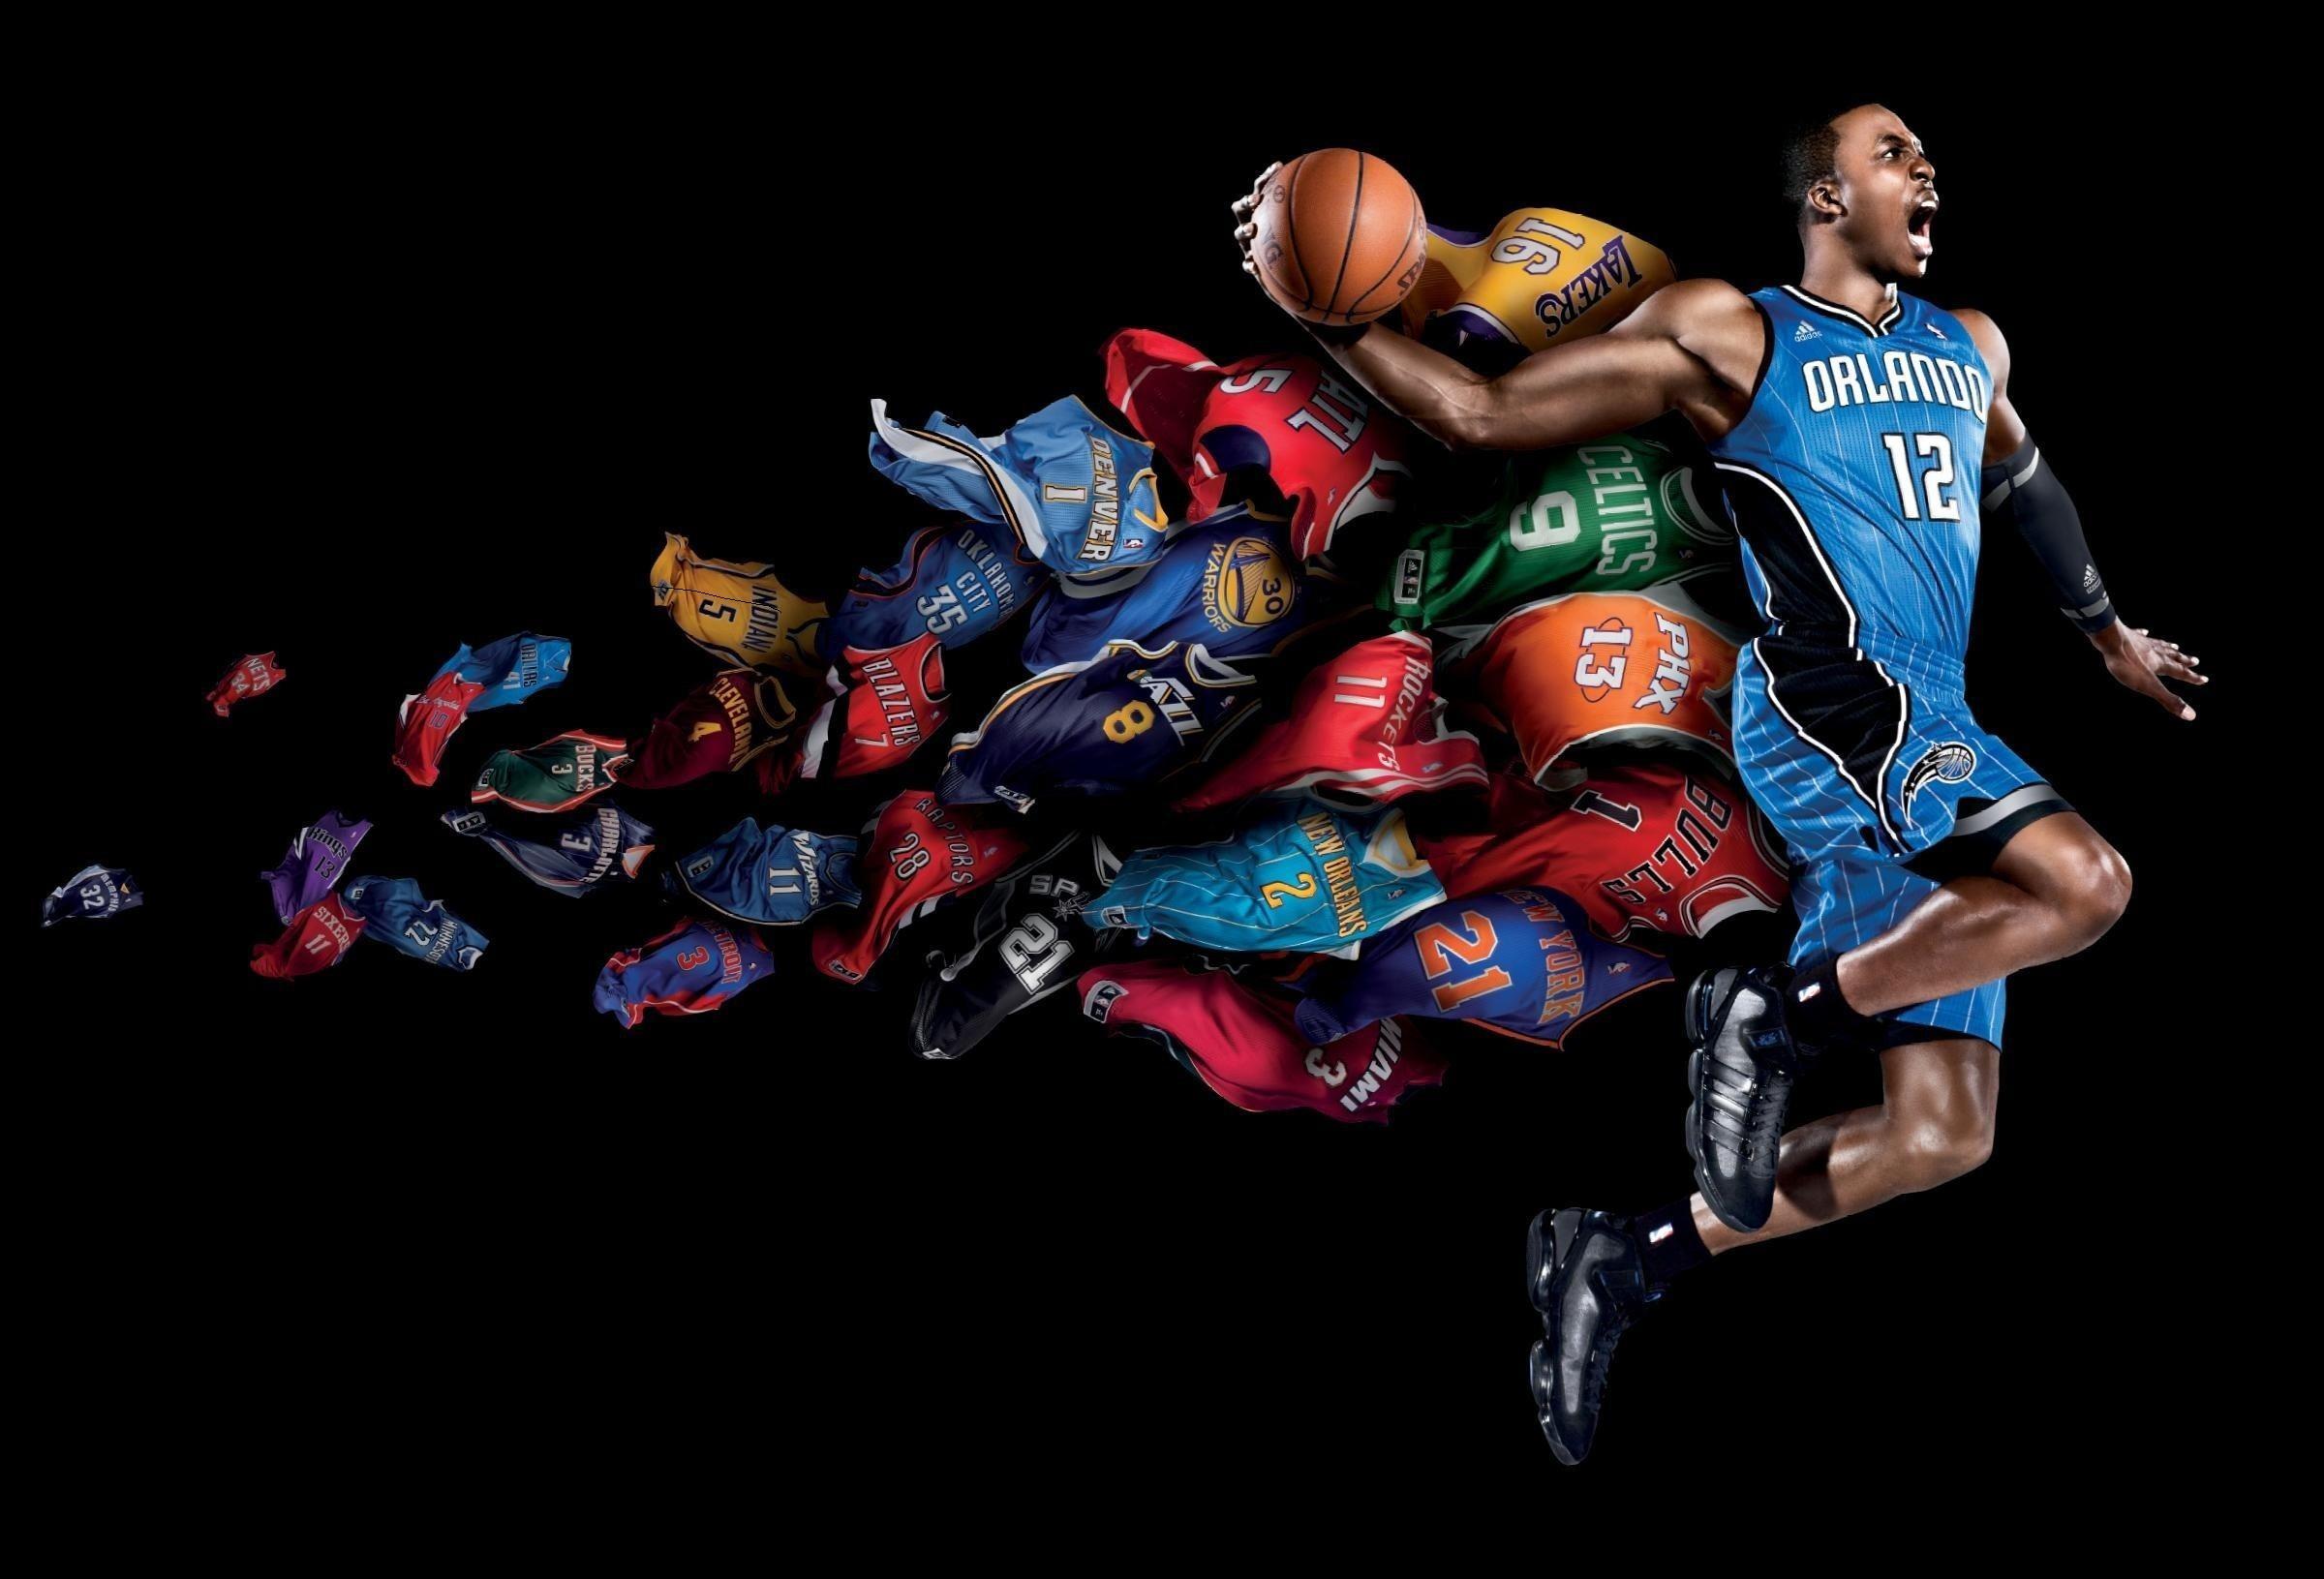 Basketball HD Wallpapers | Basketball Desktop Images |